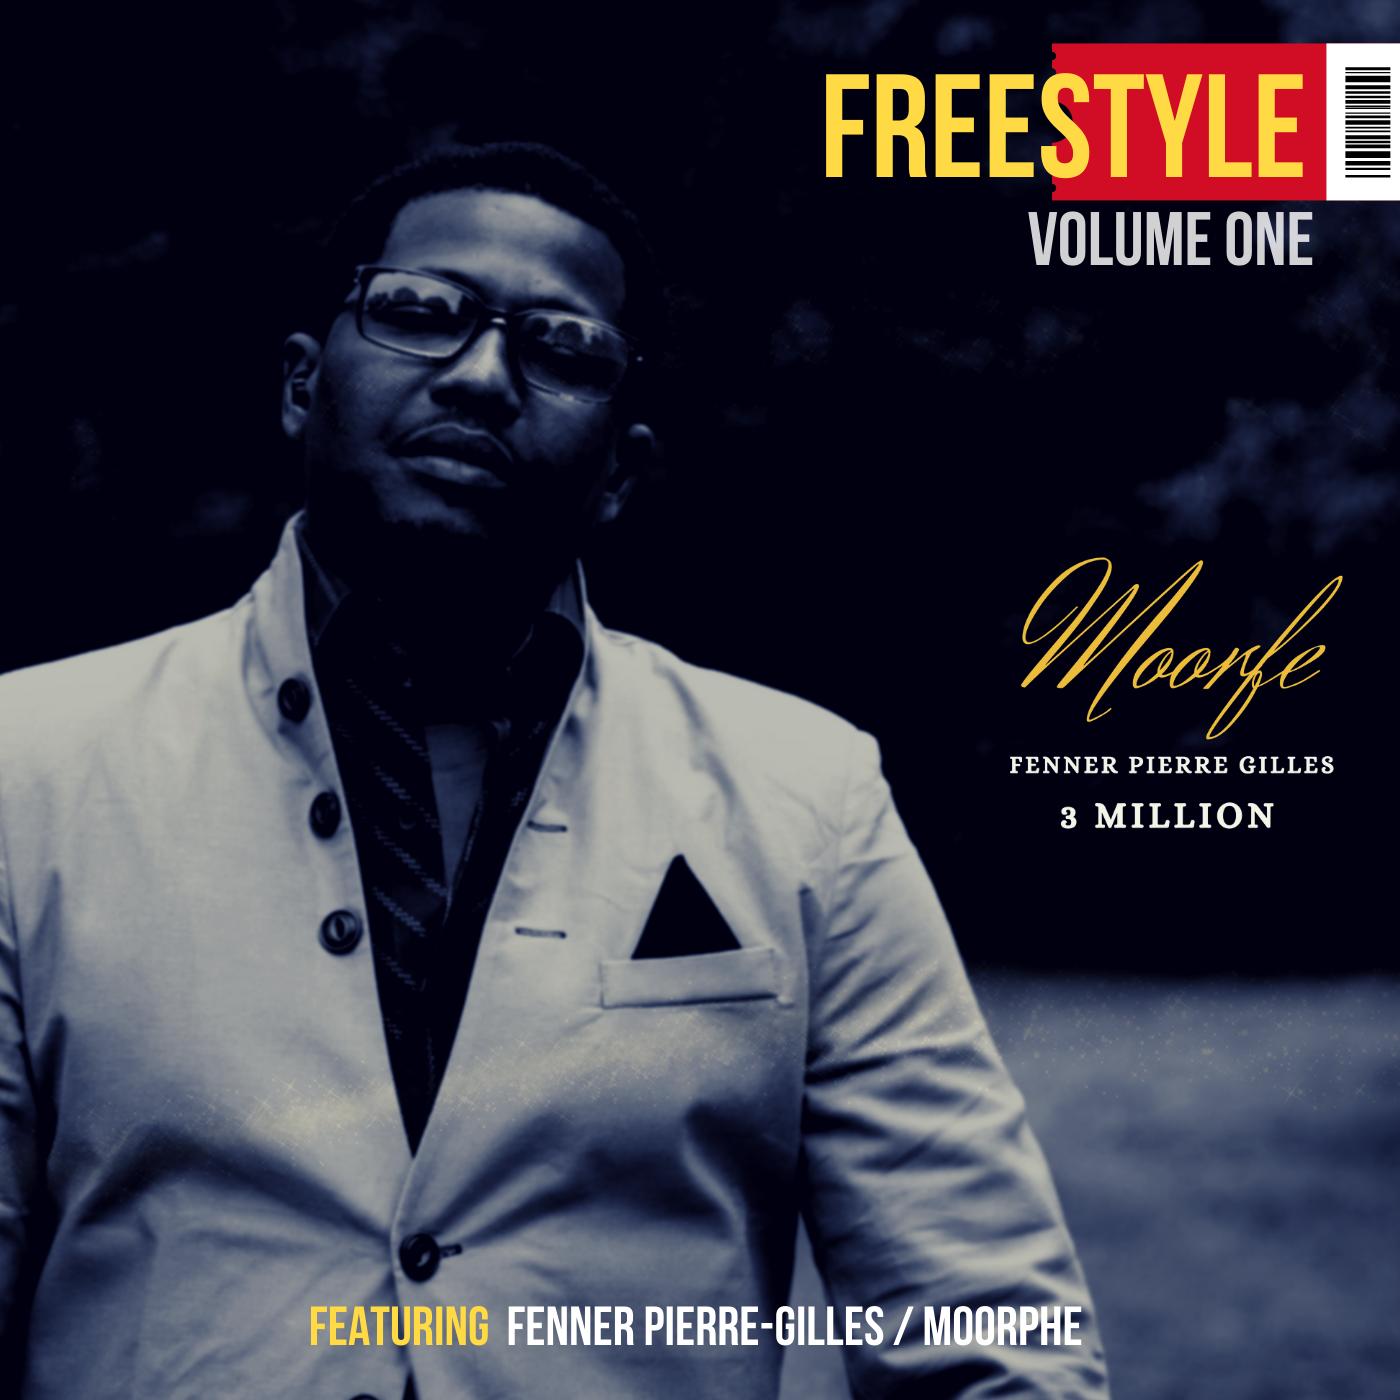 Freestyle Volume one